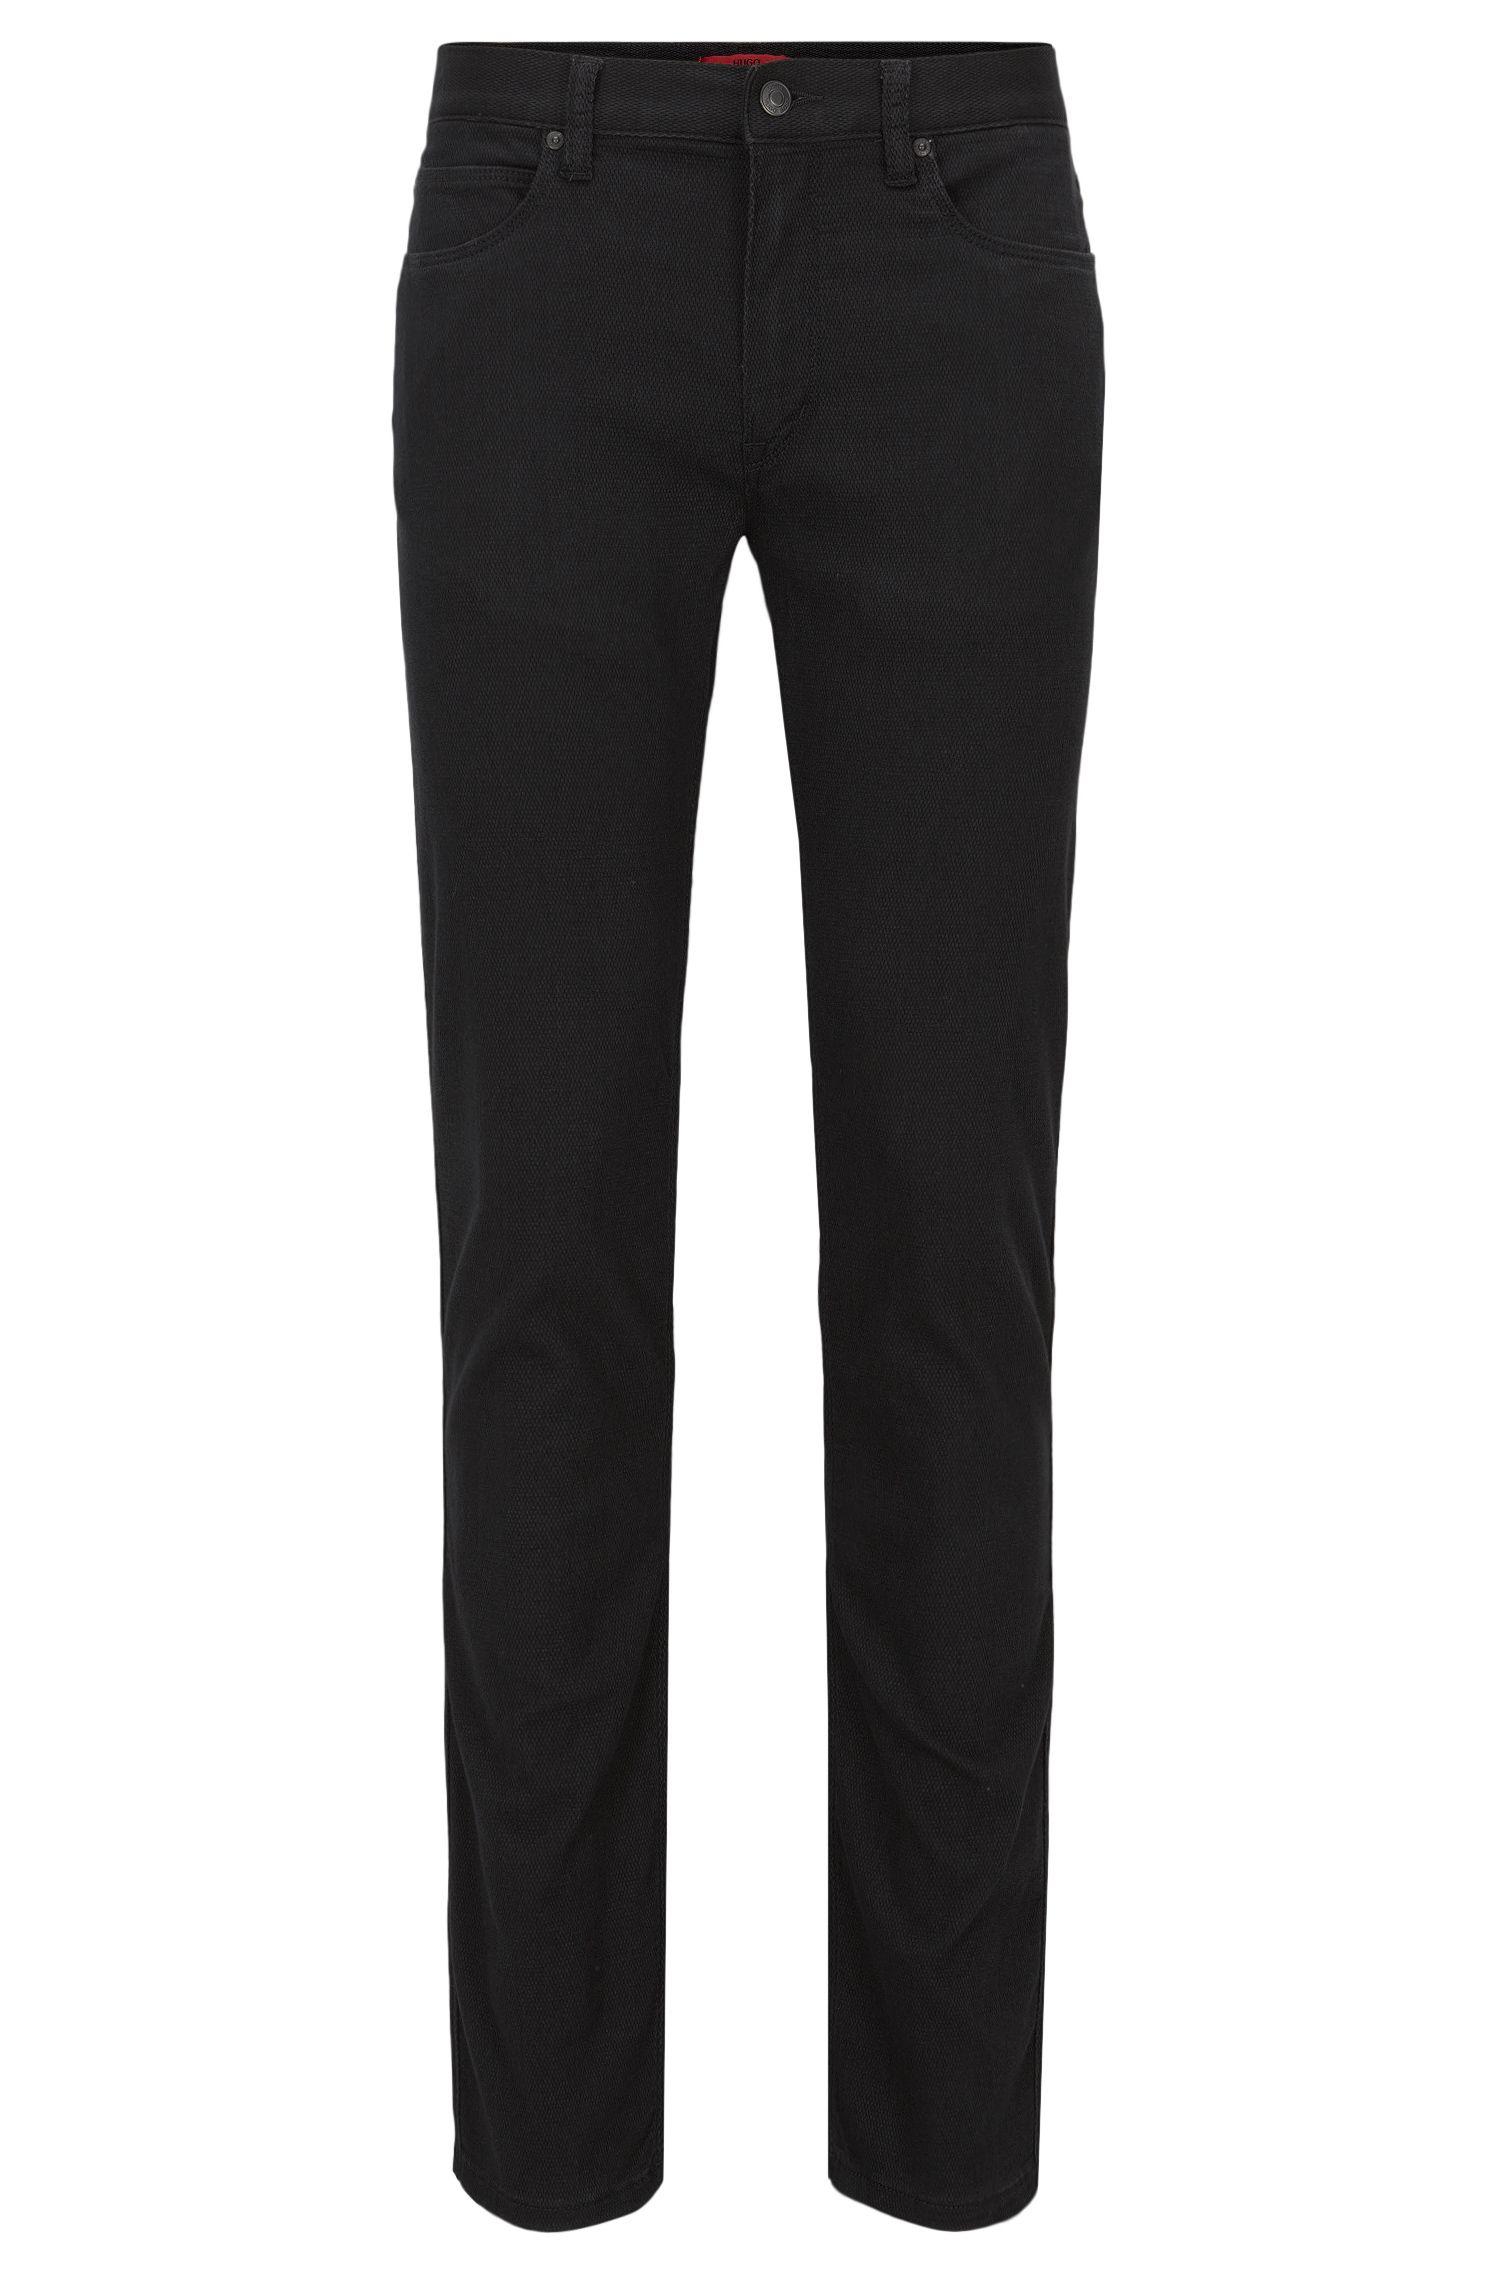 Jeans Slim Fit en denim noir effet maille